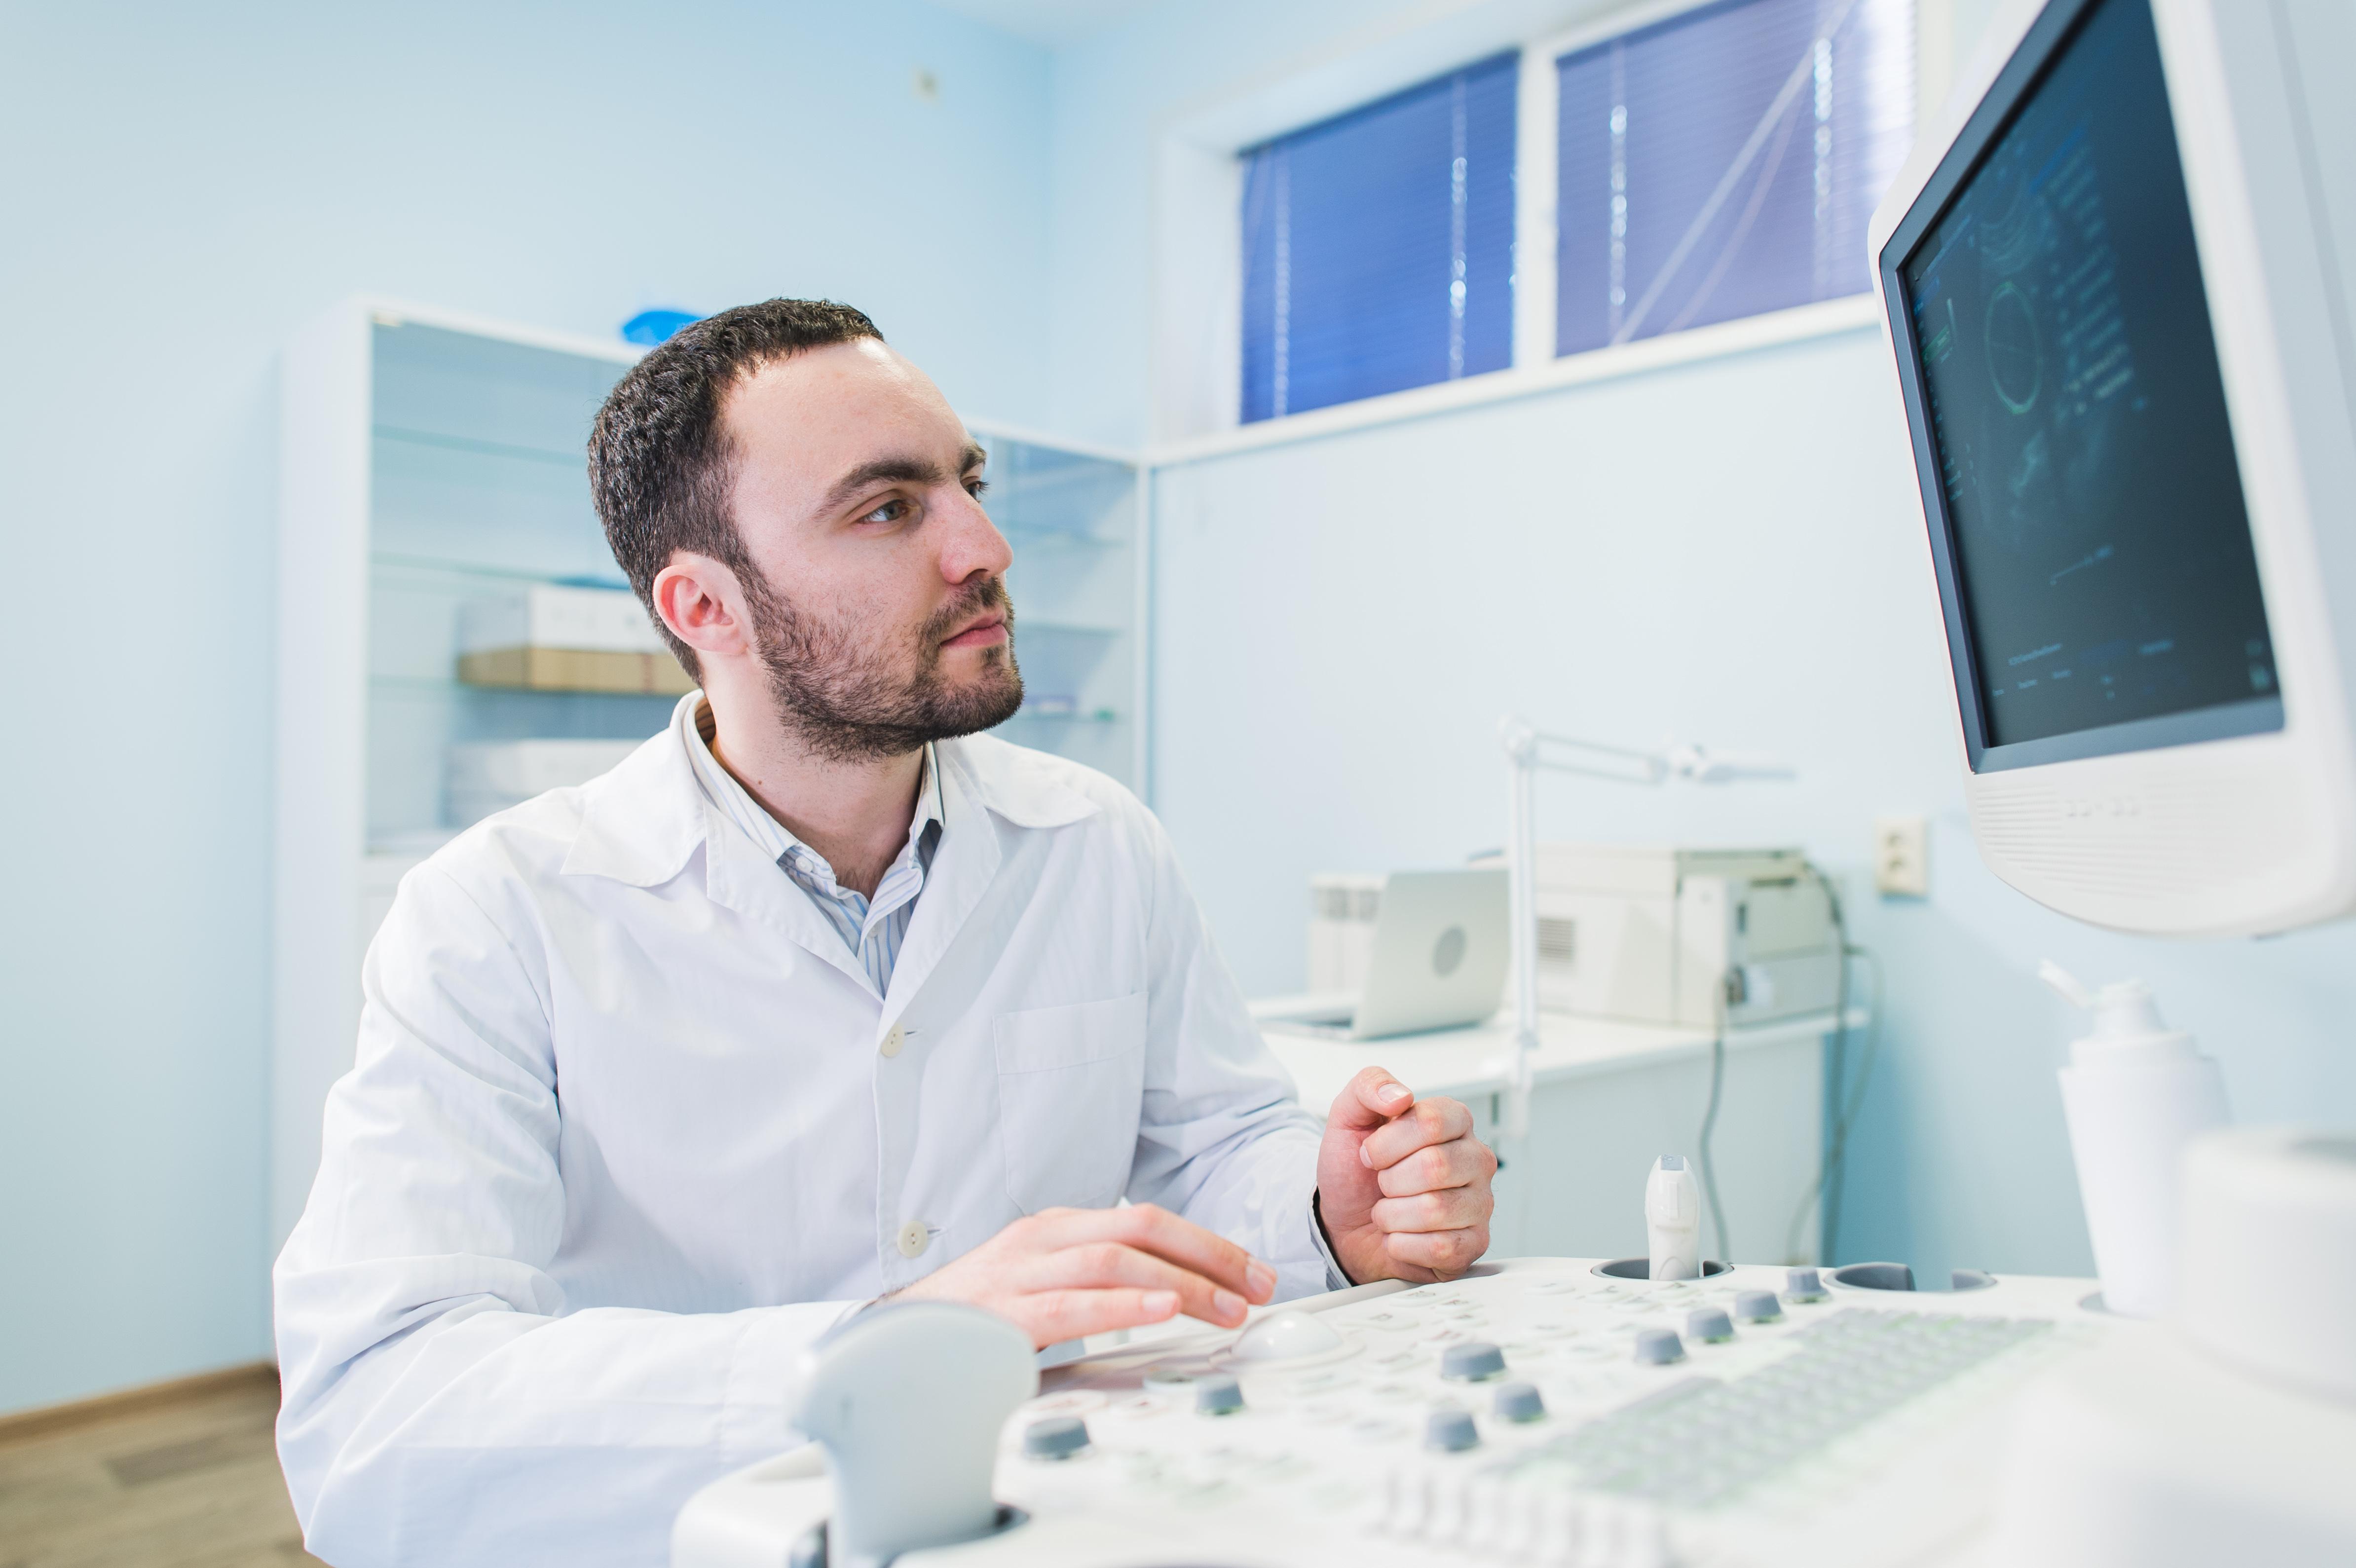 doctor using ultrasound machine